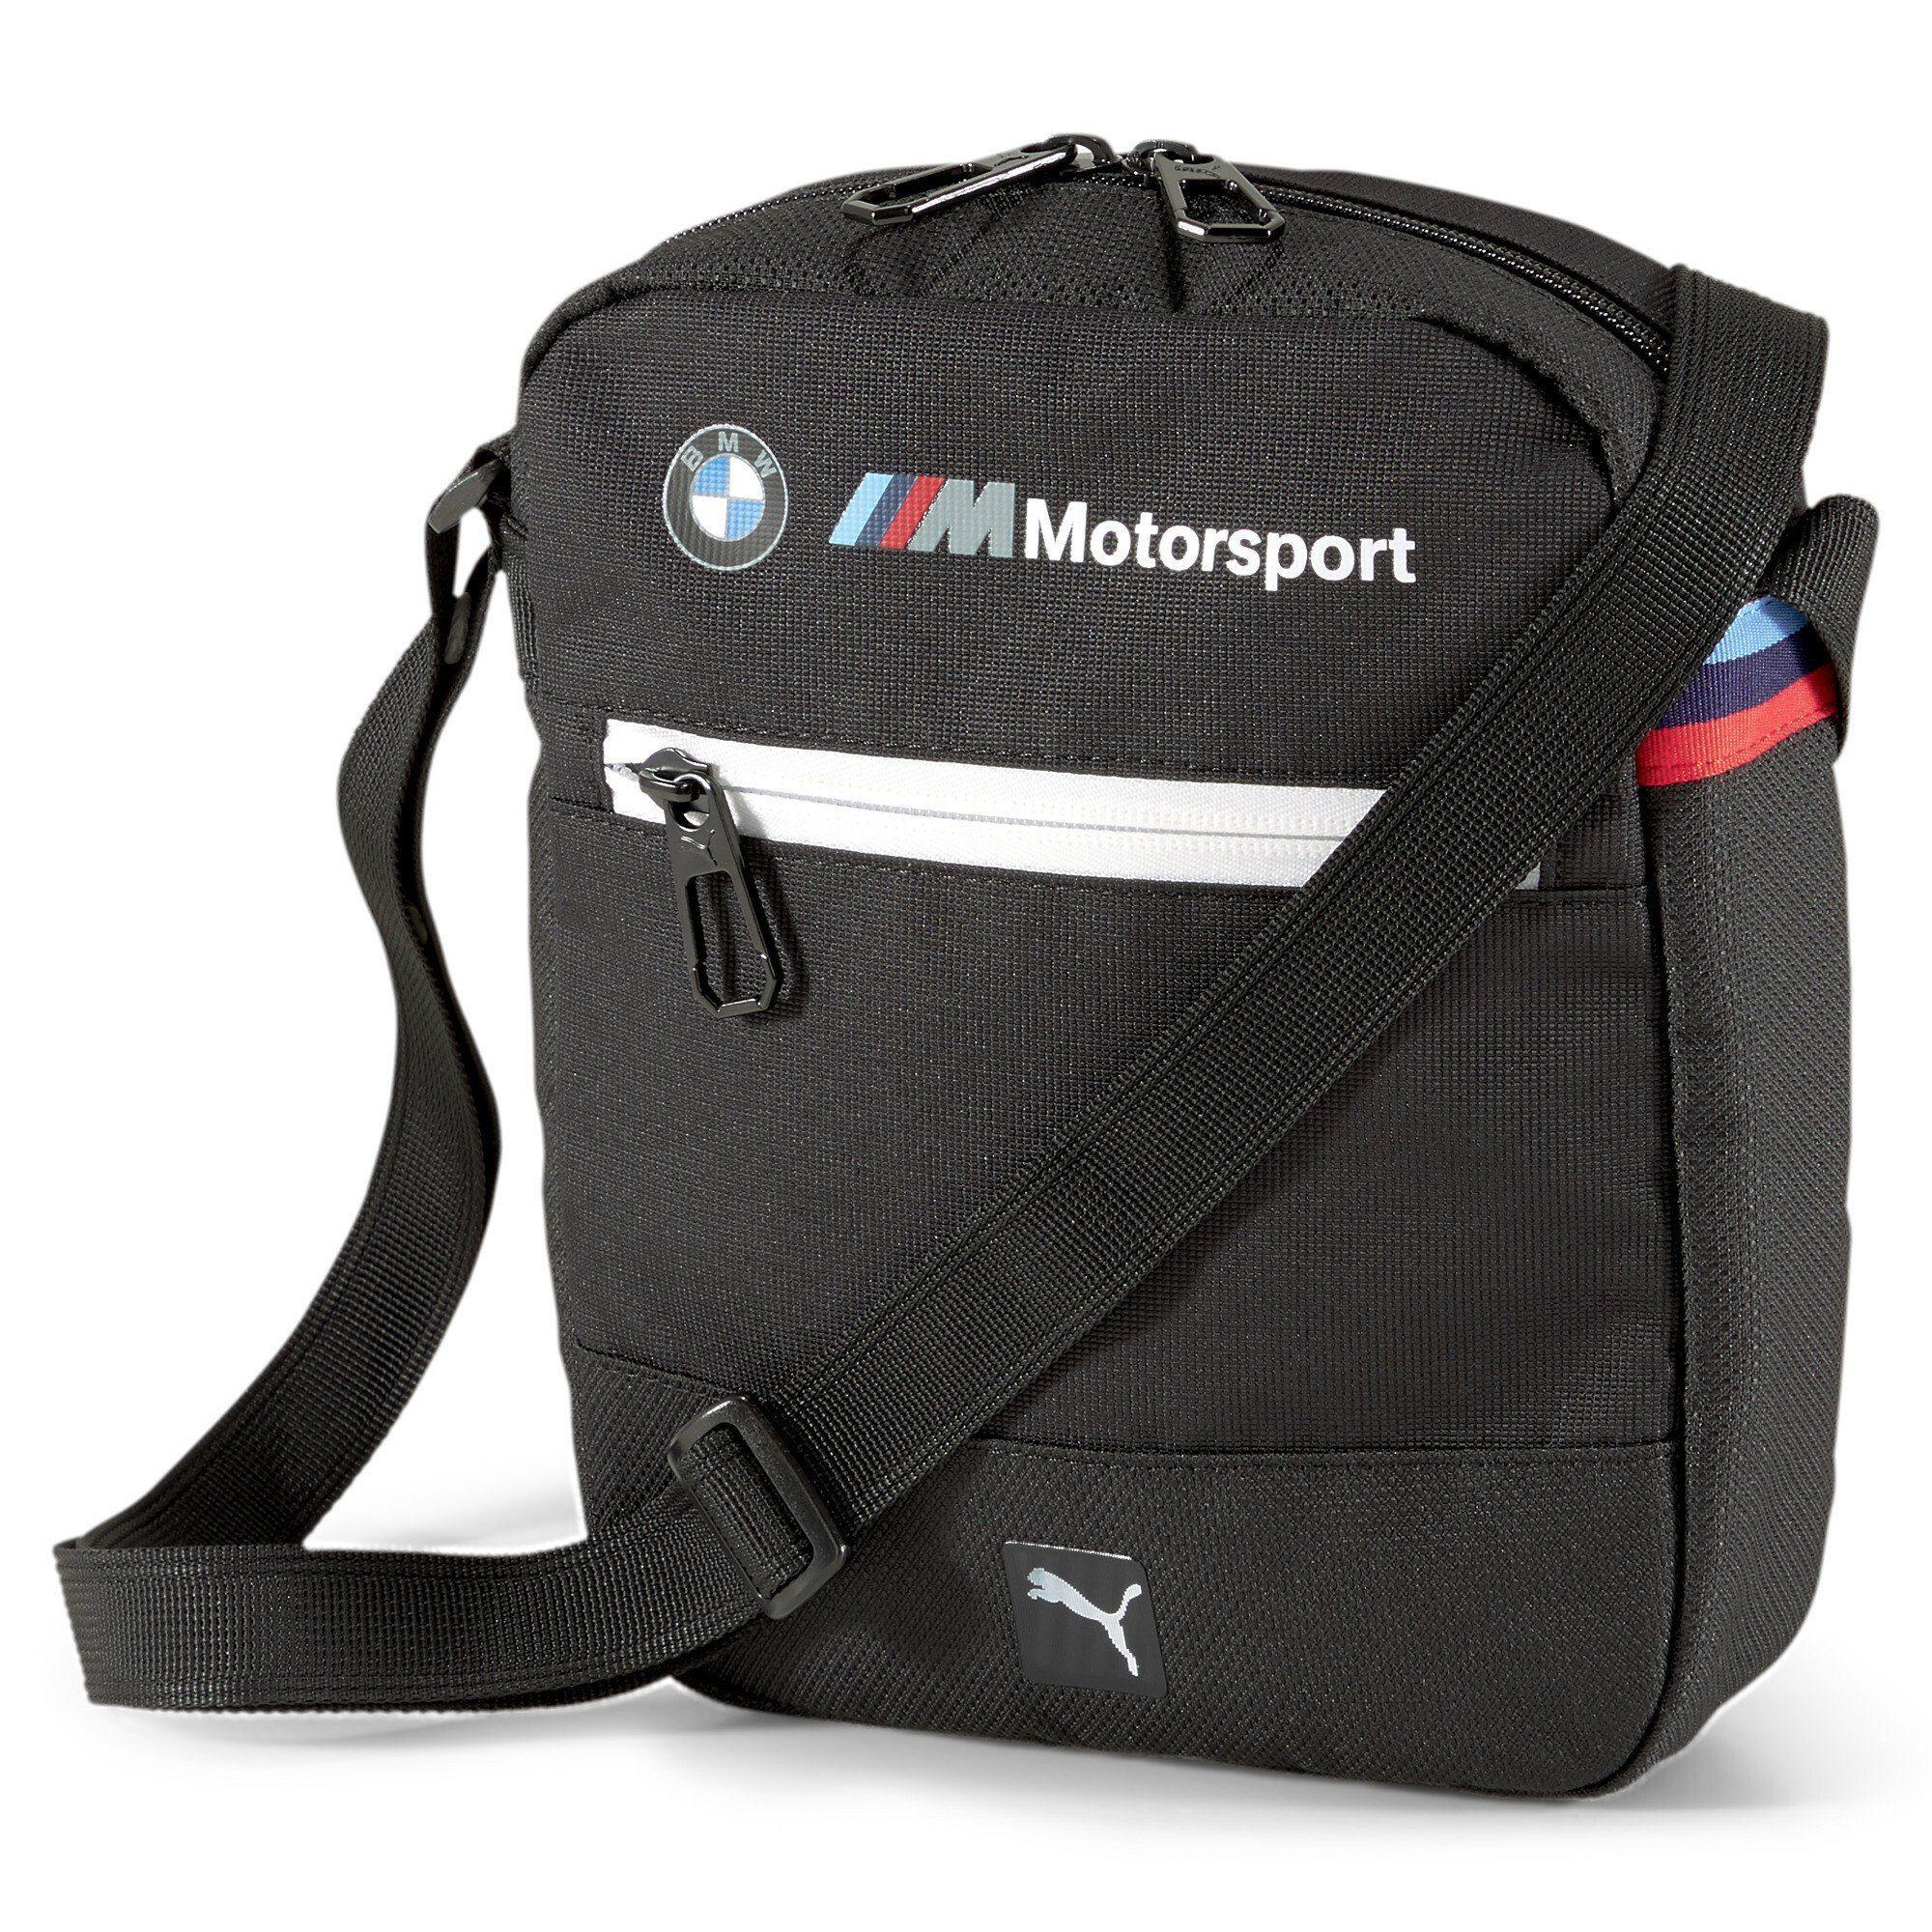 BMW M Motorsport KuLTURBEUTEL Collection.